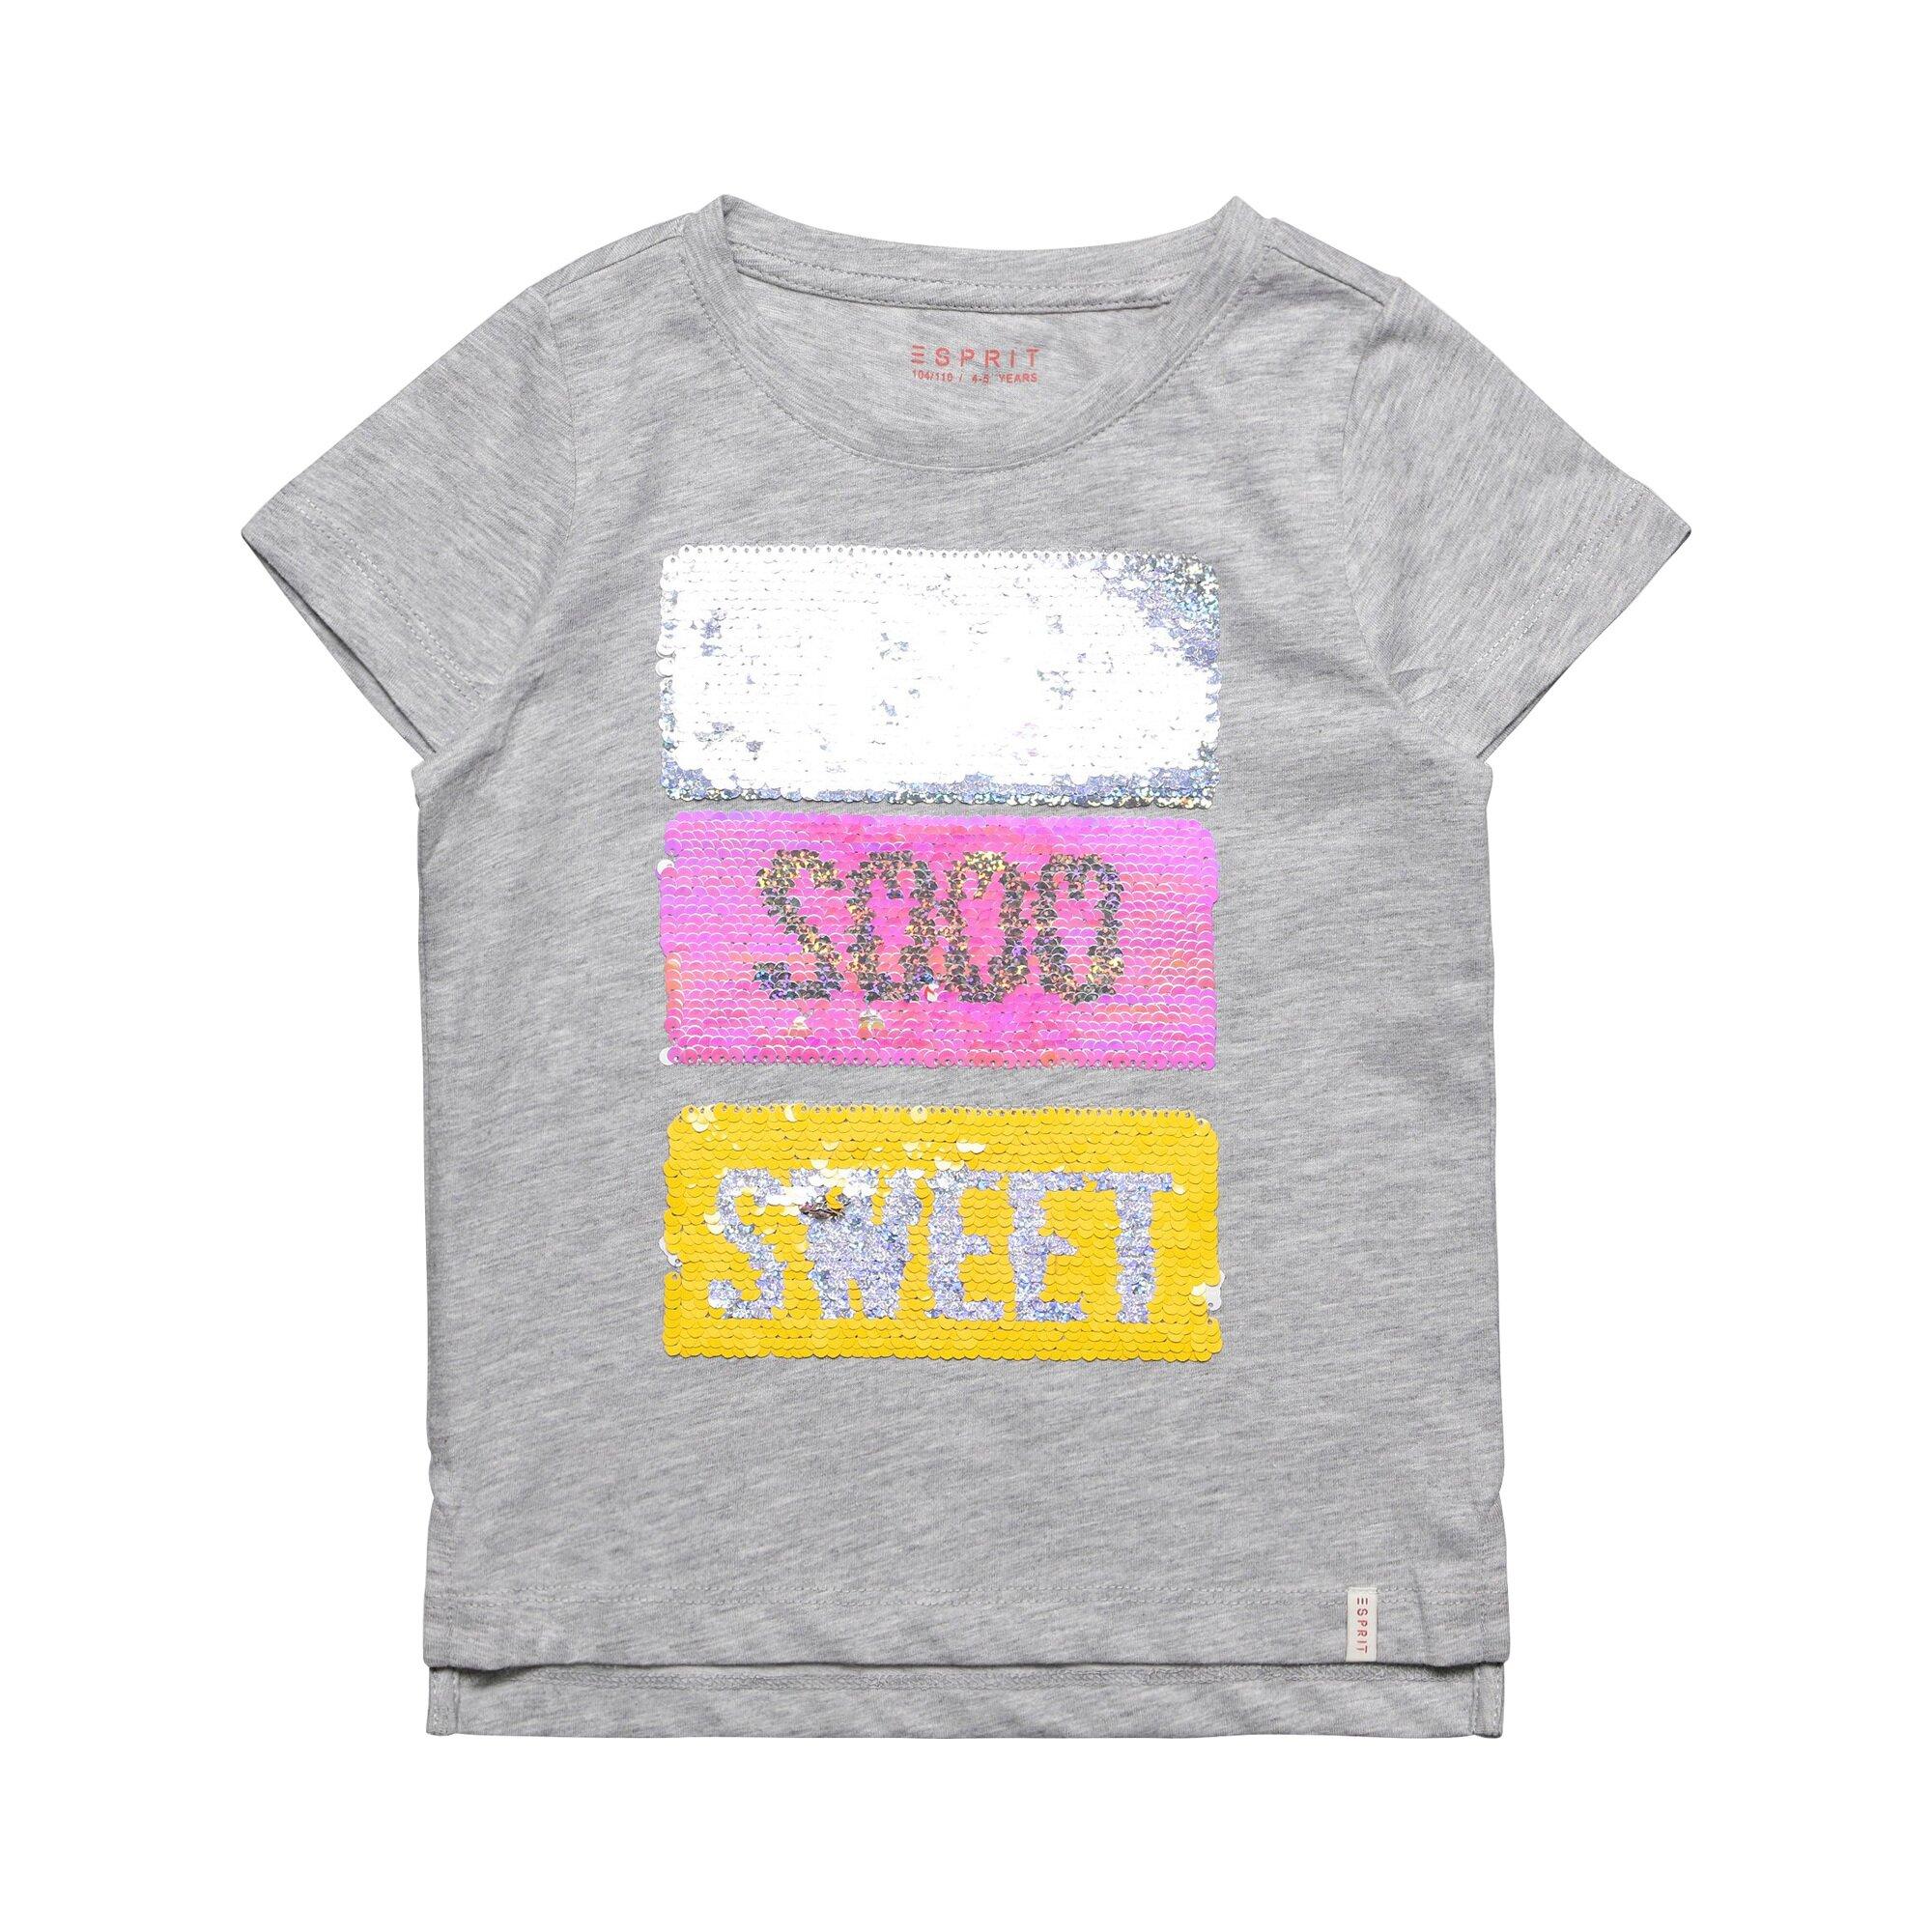 esprit-t-shirt-wendepailletten